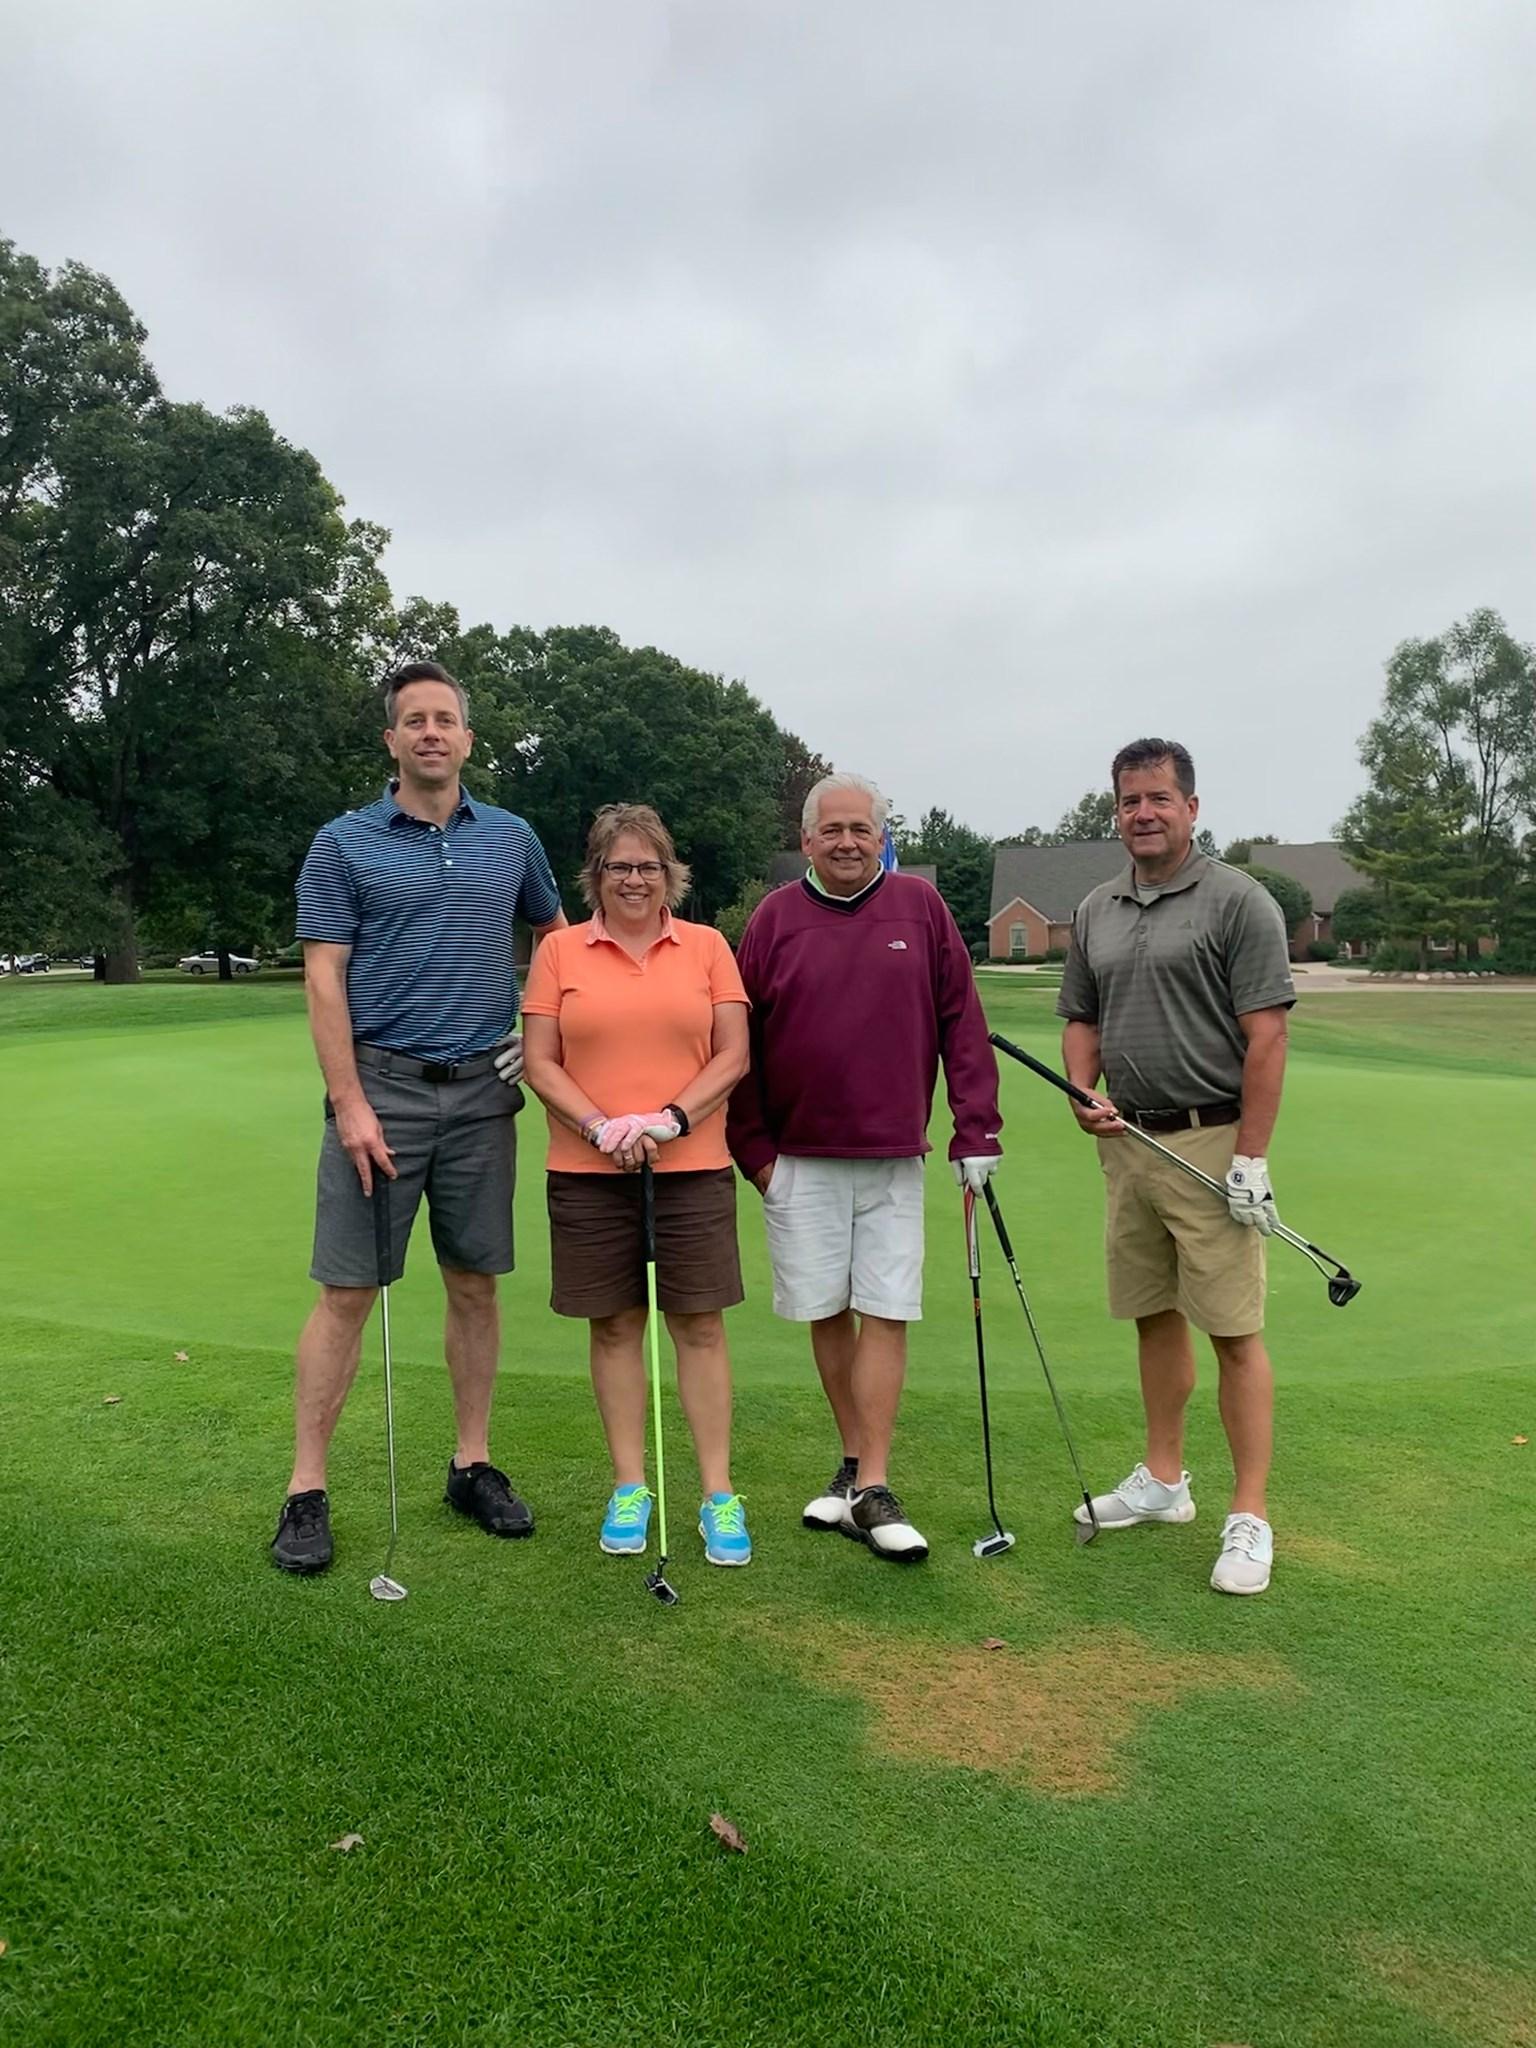 SACC-Golf-Outing-2021-MMI.jpg